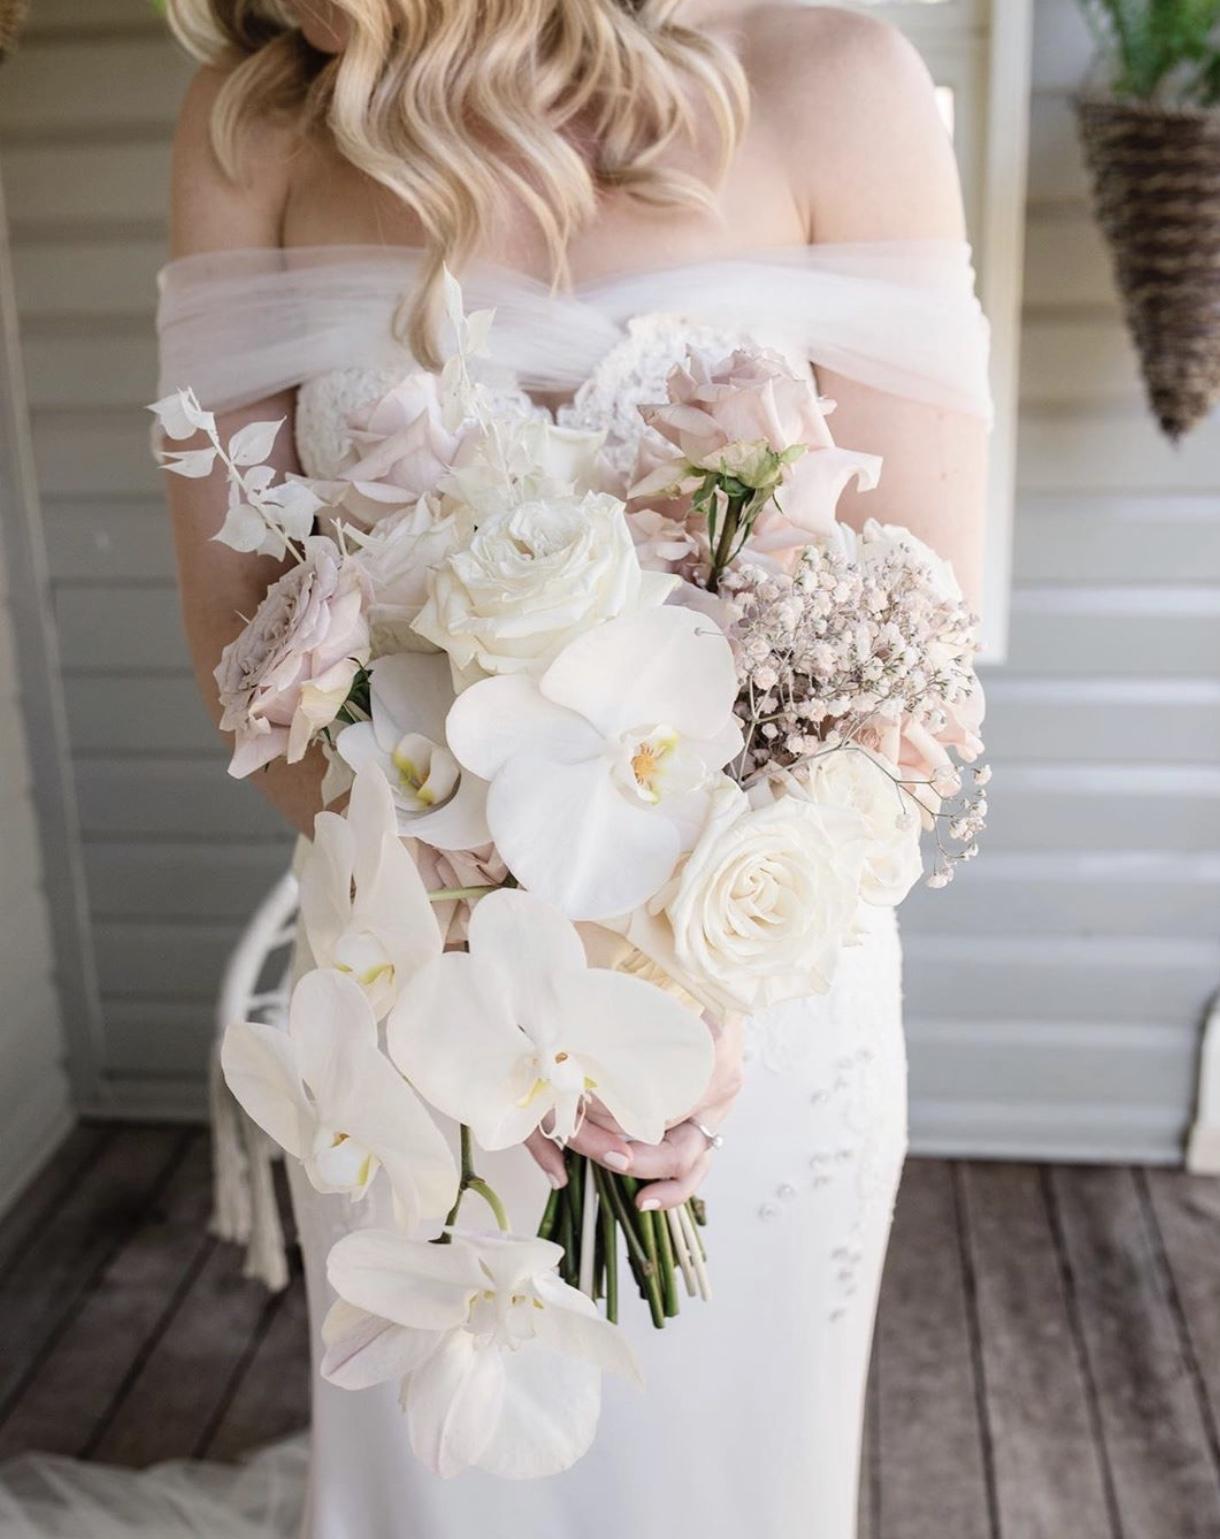 bernadette graffin photography brisbane weddings floral designer flowers arrangements bridal bouquets